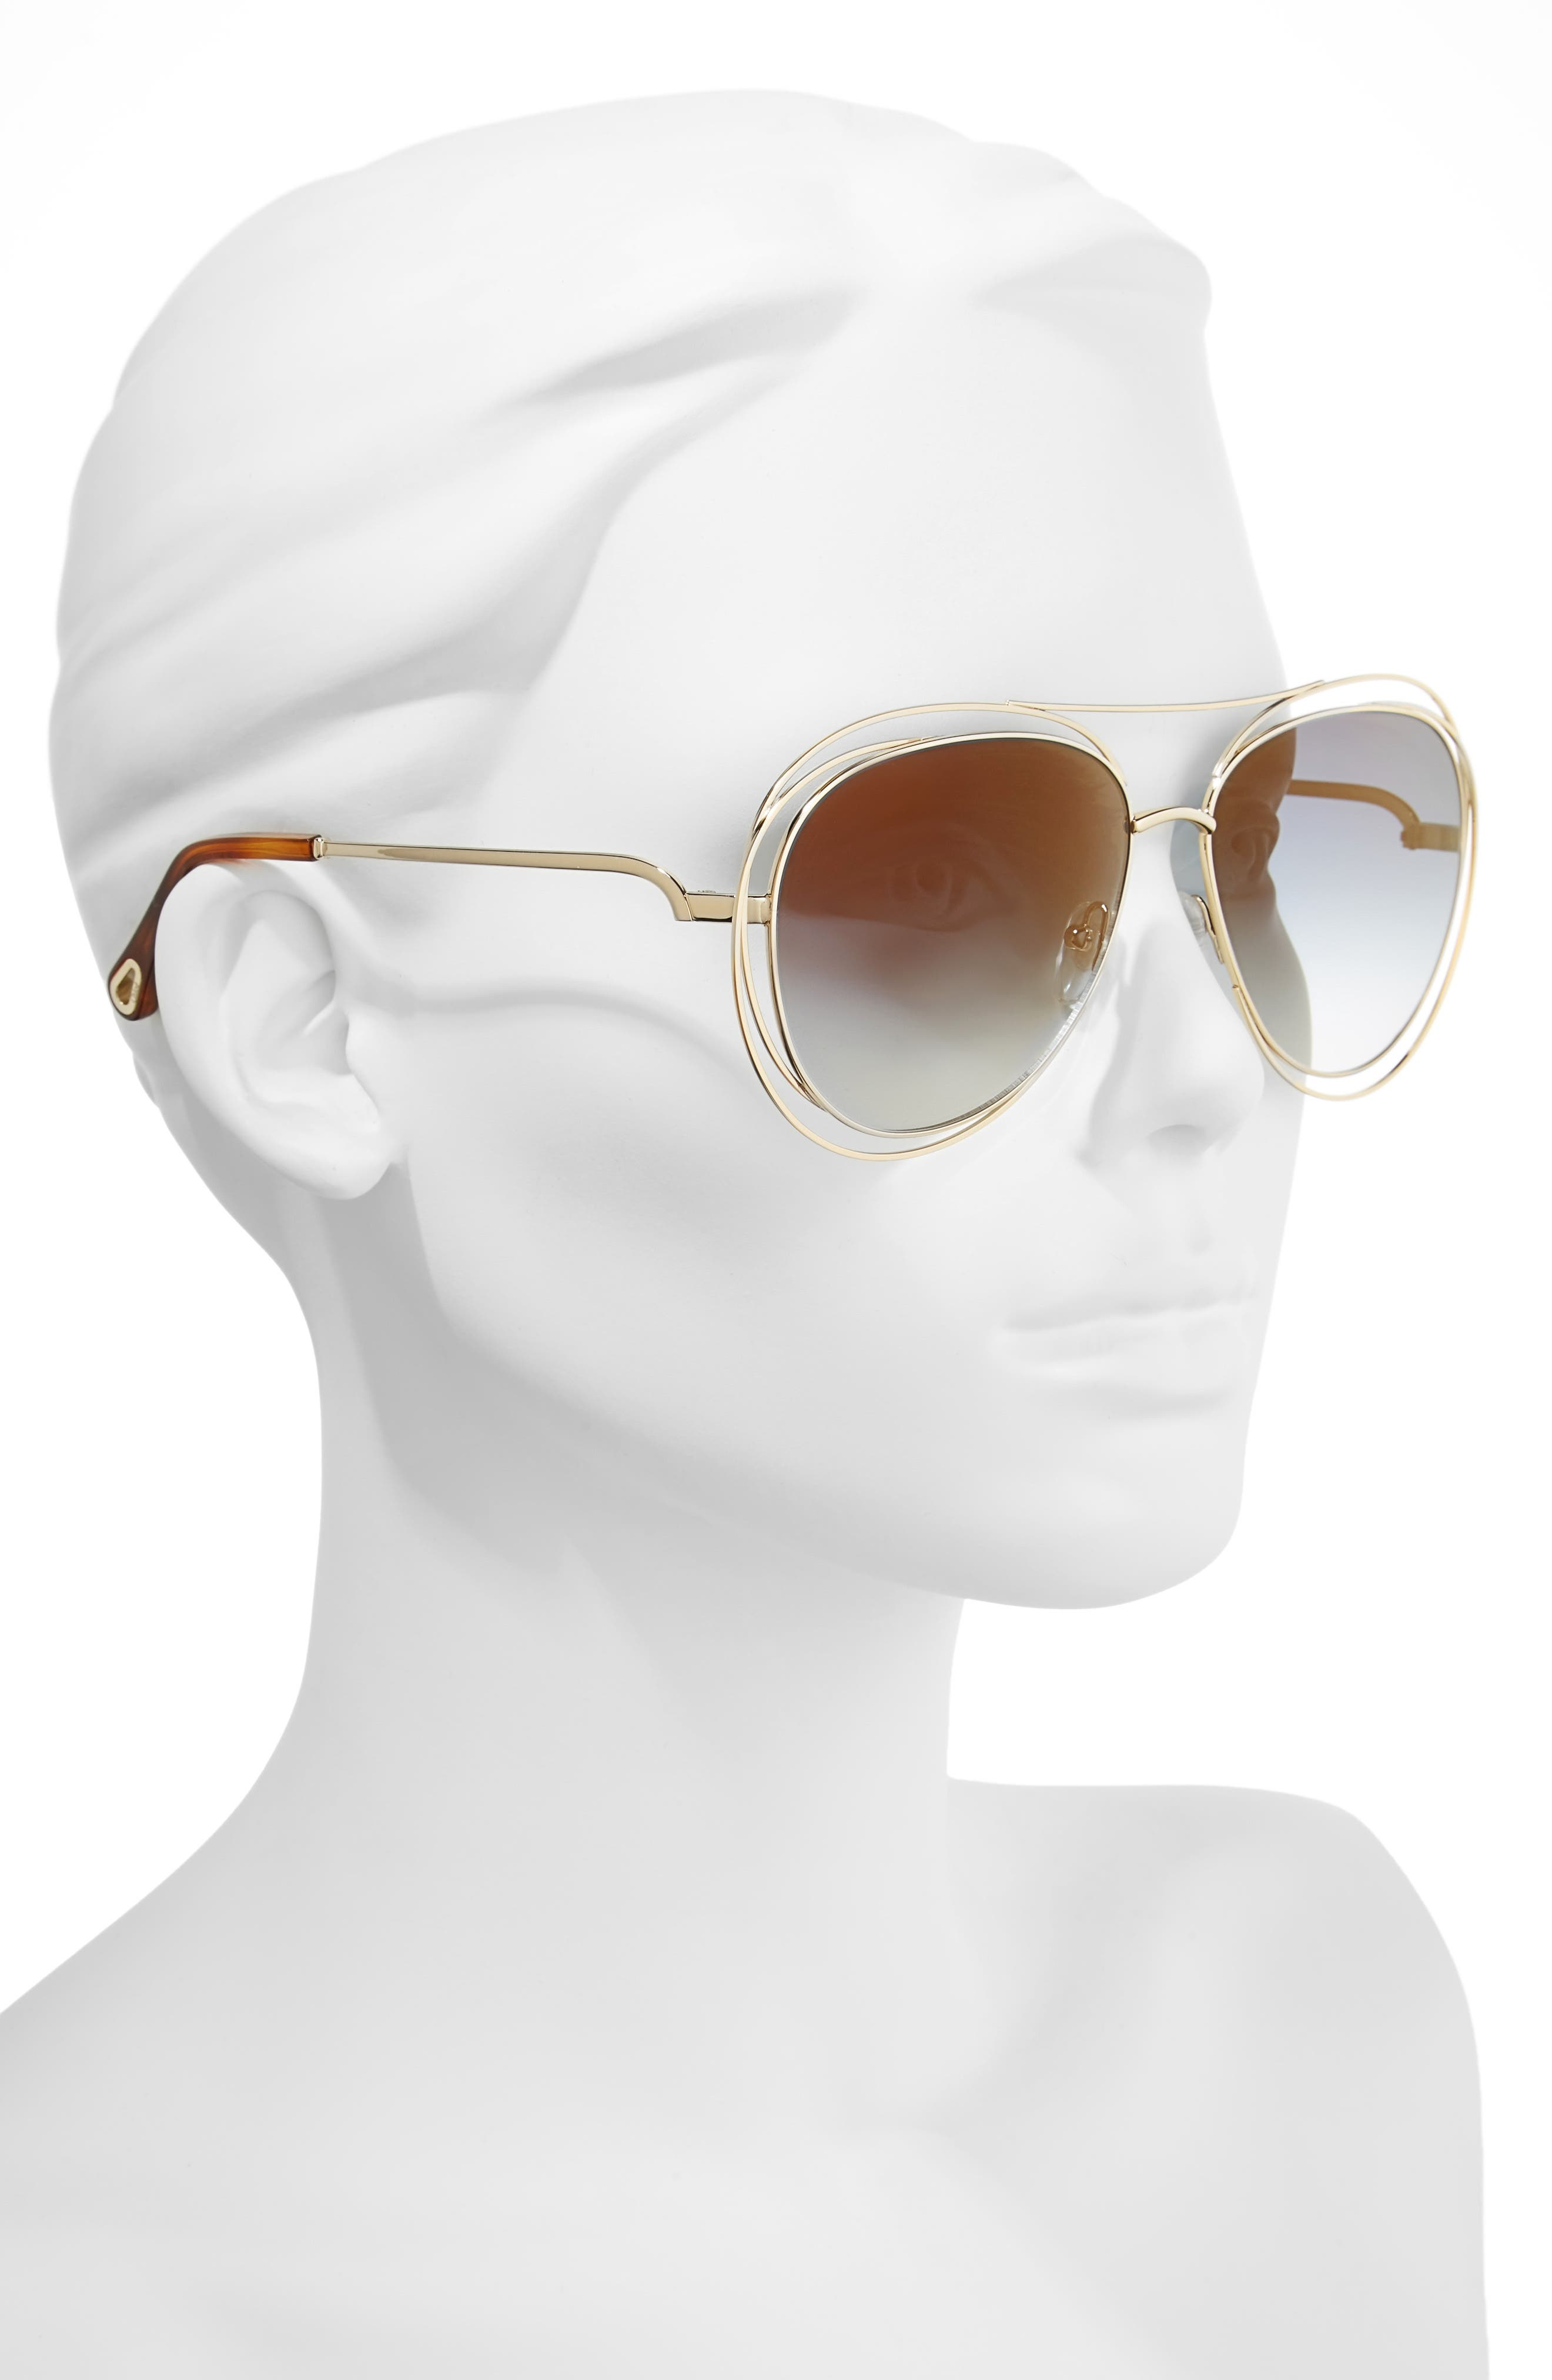 CHLOÉ, 61mm Aviator Sunglasses, Alternate thumbnail 2, color, GOLD/ HAVANA/ FLASH BLUE